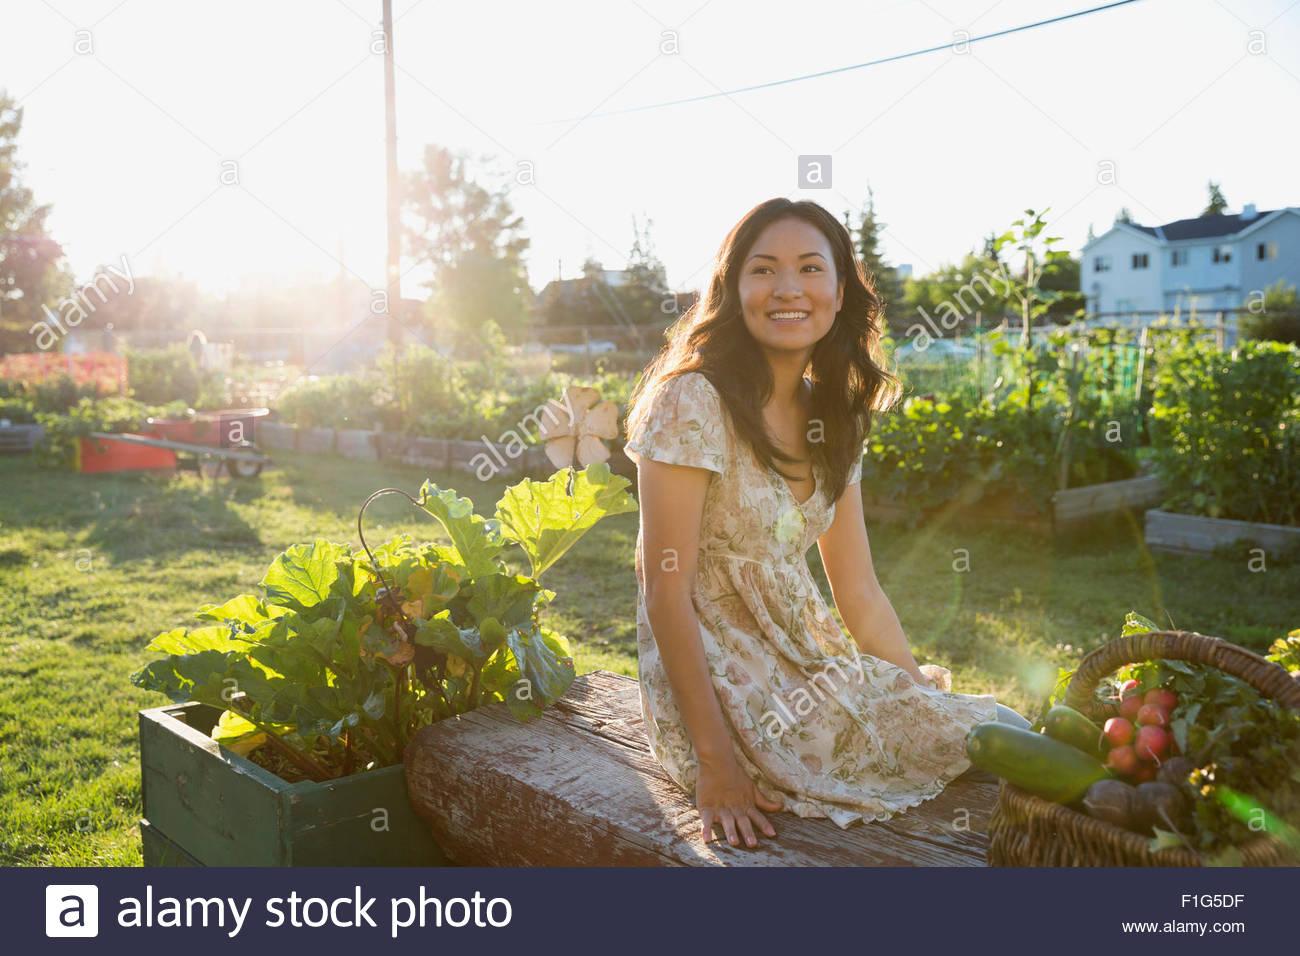 Smiling teenage girl harvesting vegetables in garden - Stock Image